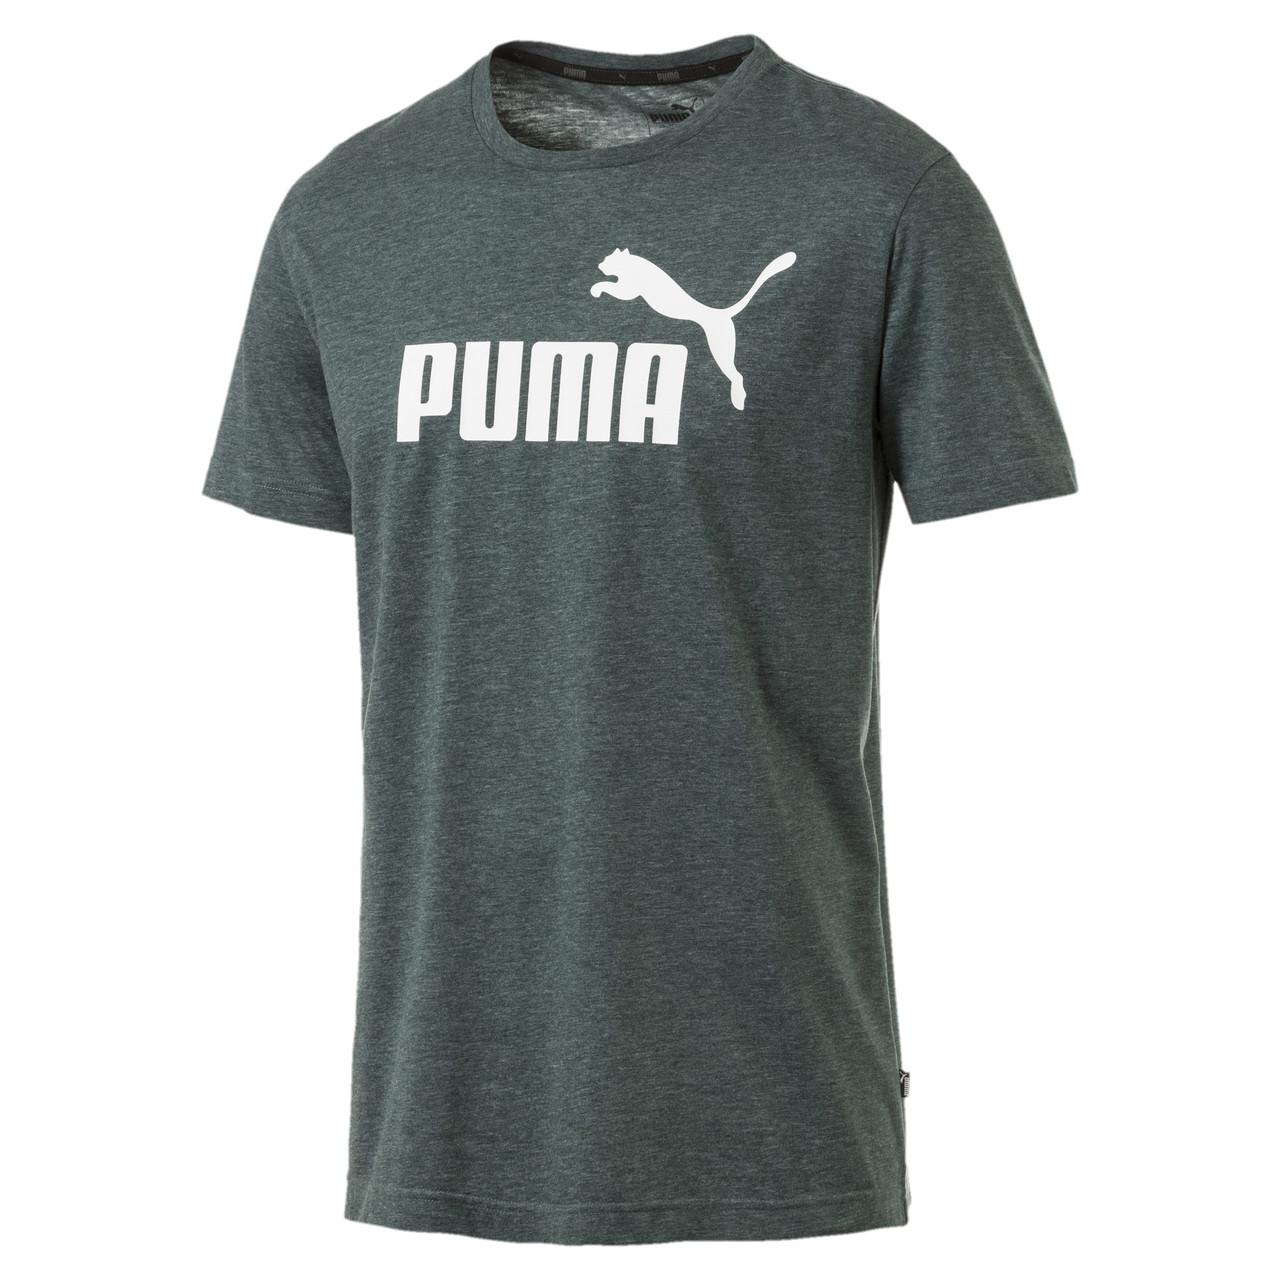 Мужская спортивная футболка Heather Men'S T-Shirt